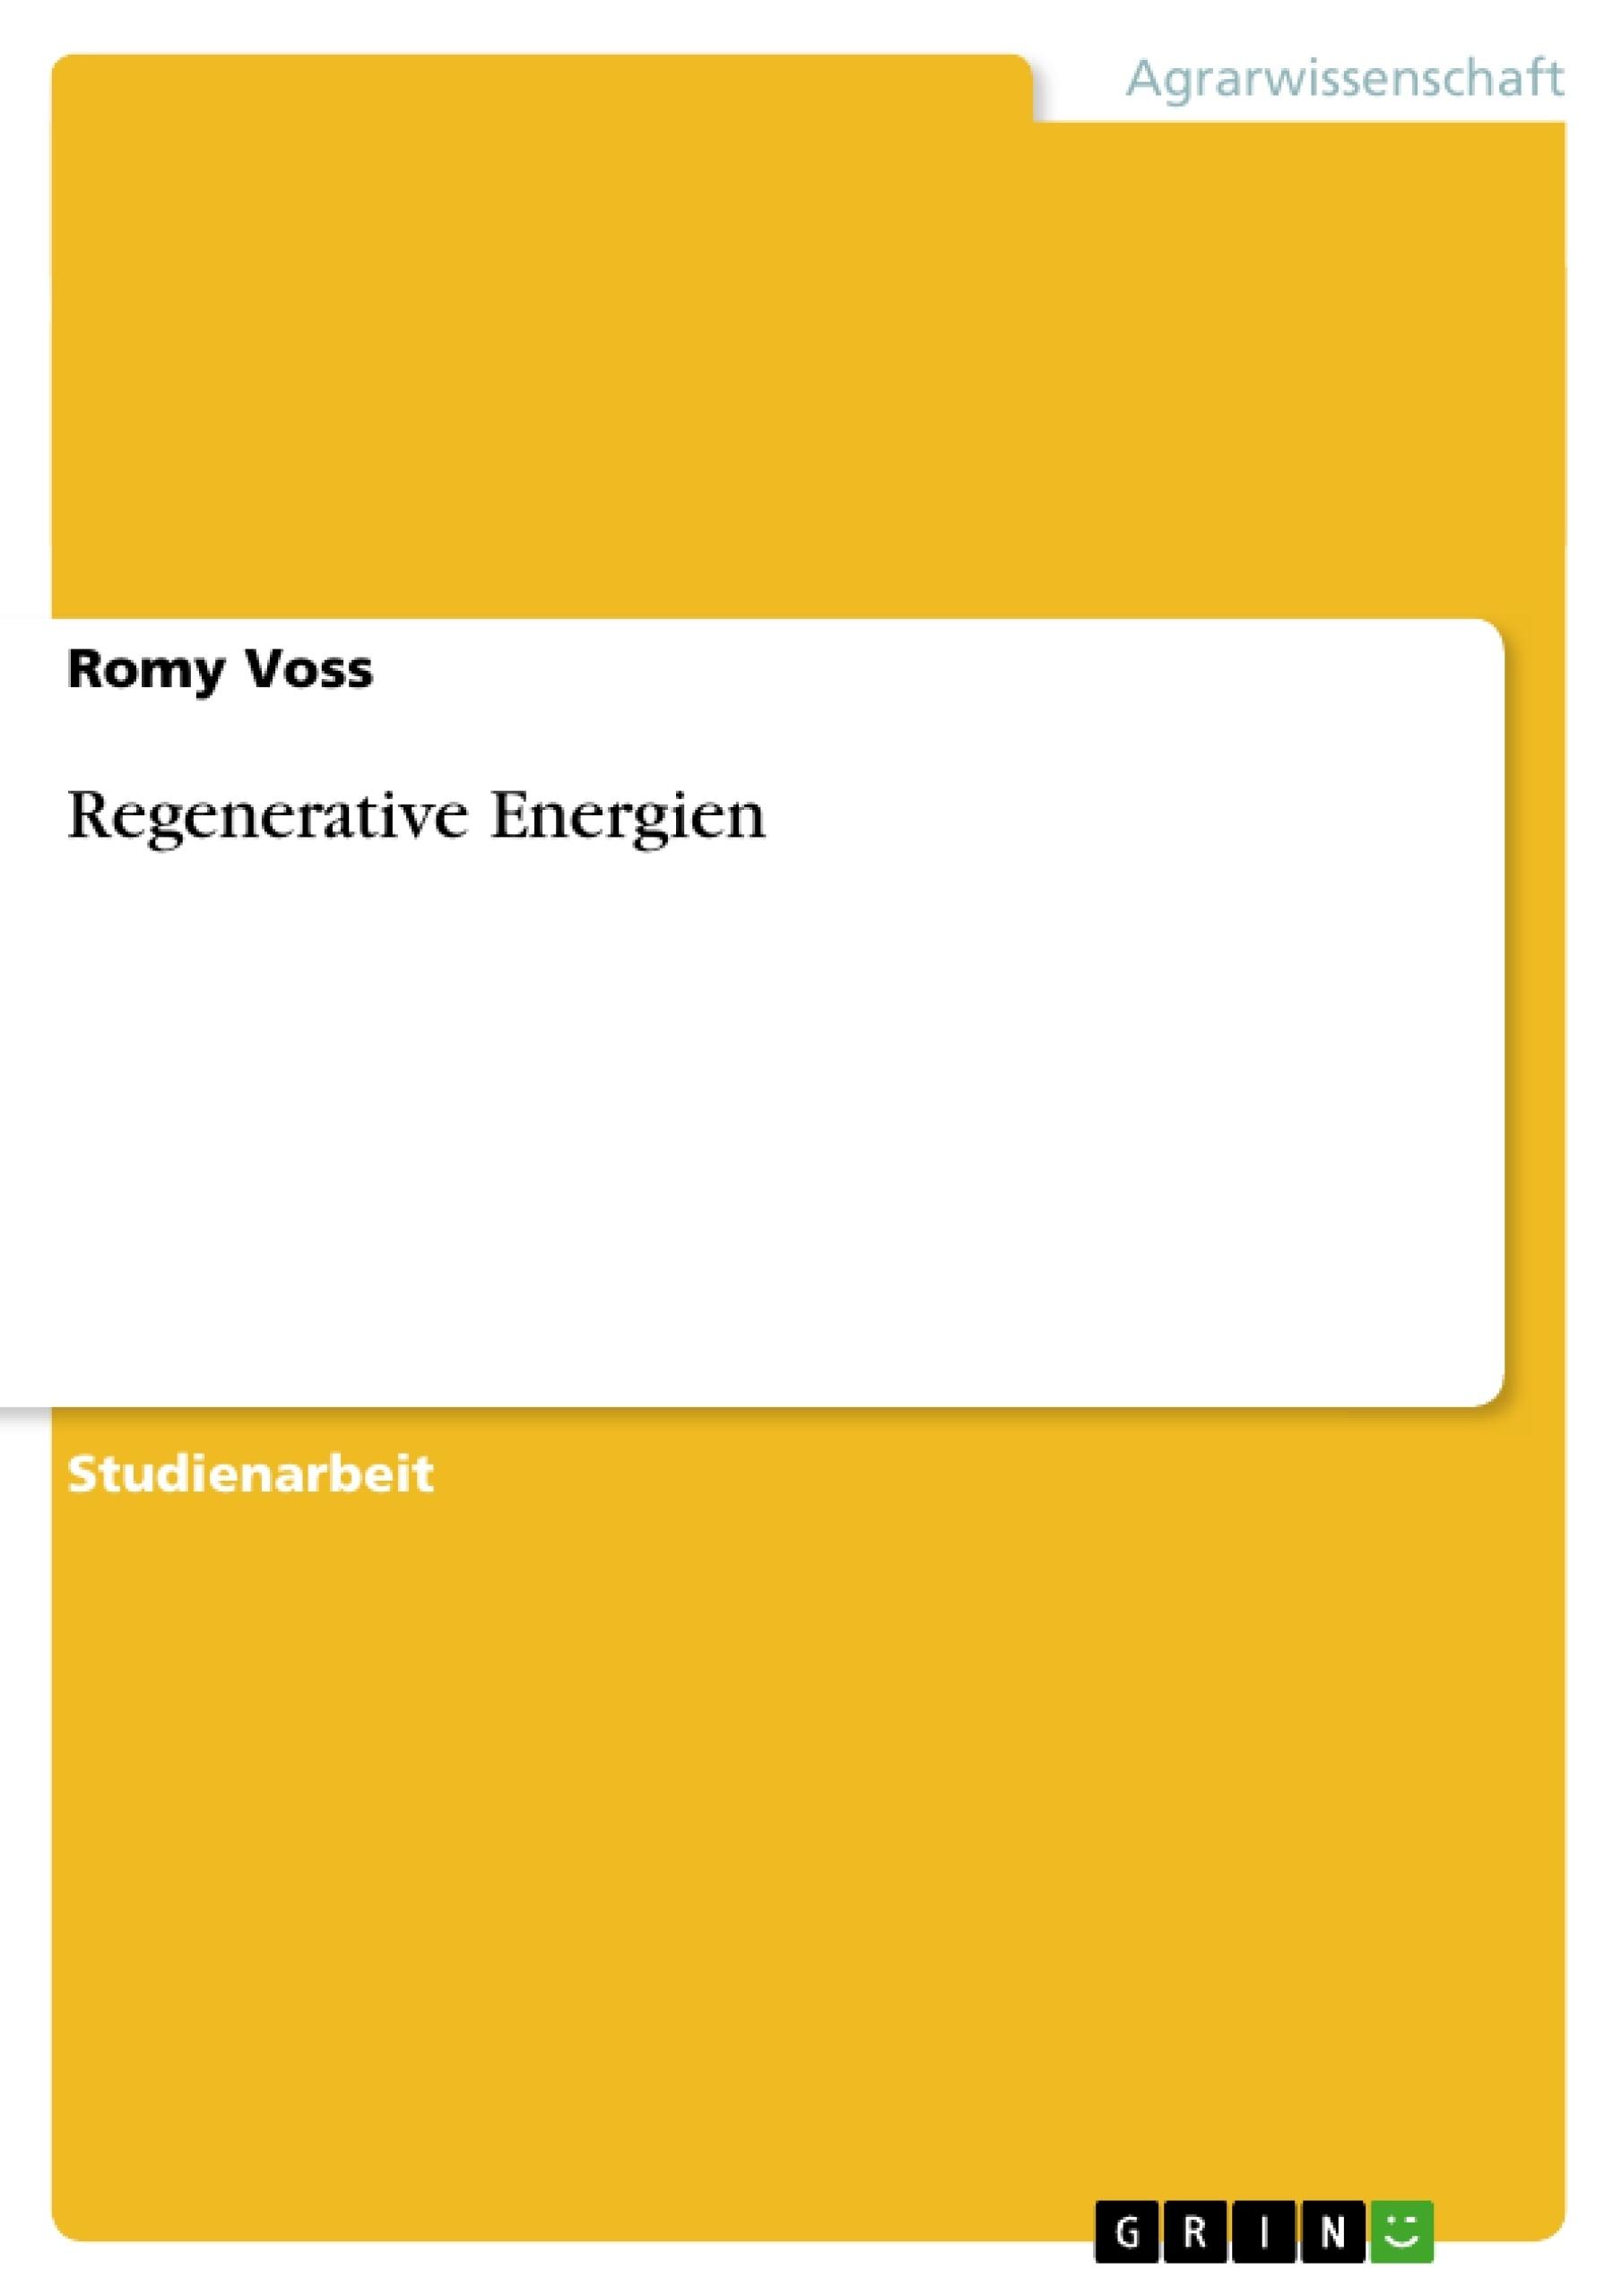 Titel: Regenerative Energien